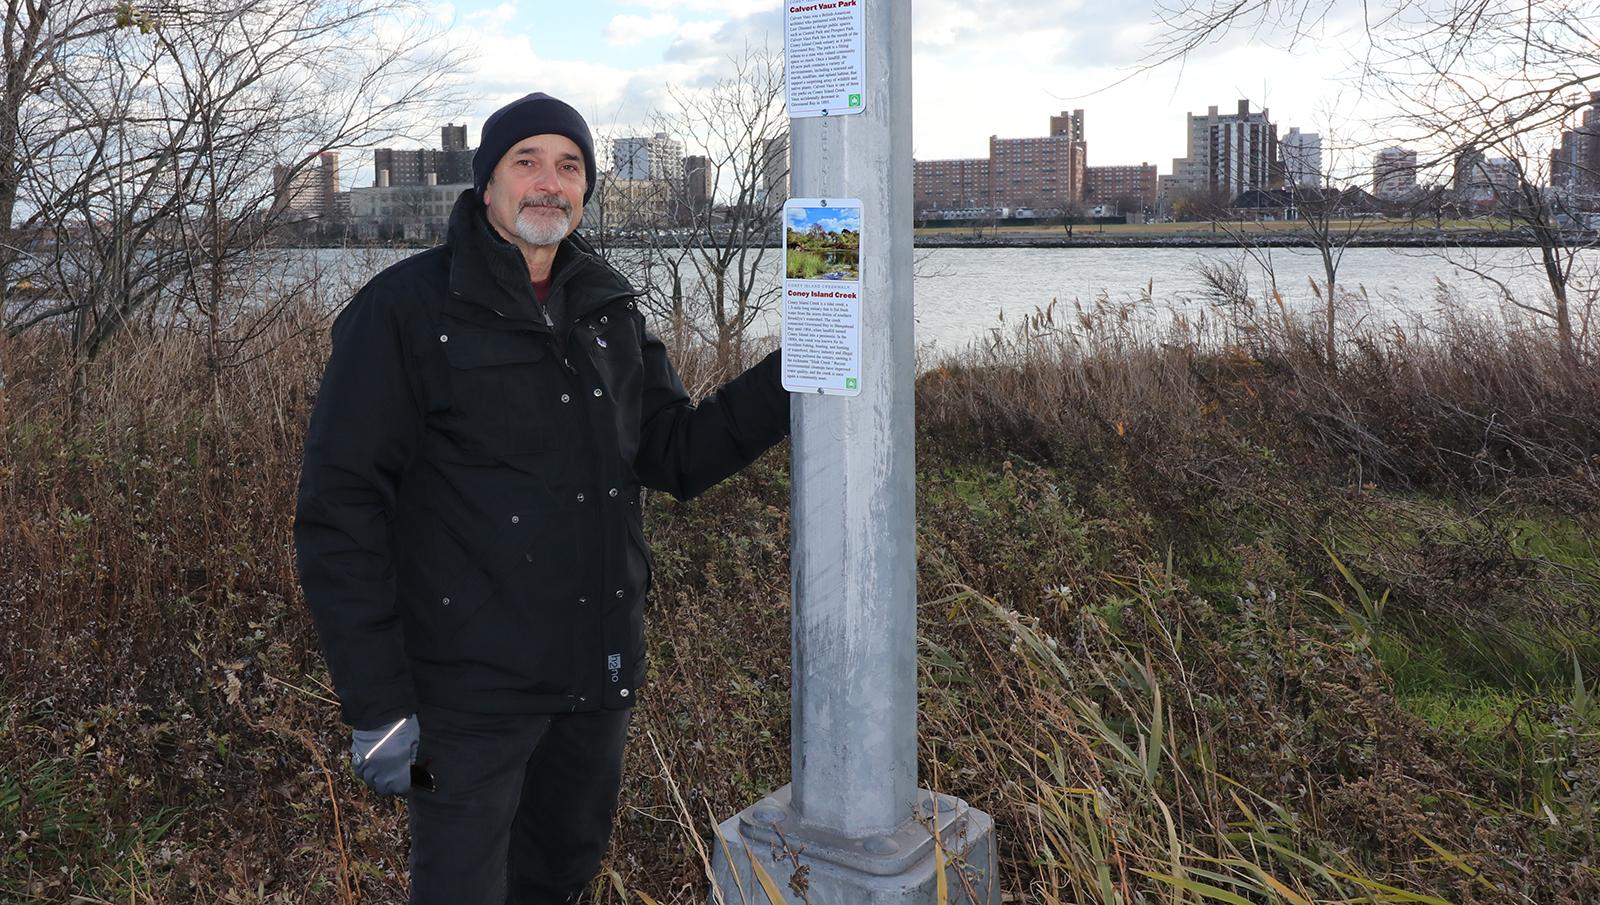 Charles Denson at Coney Island Creek